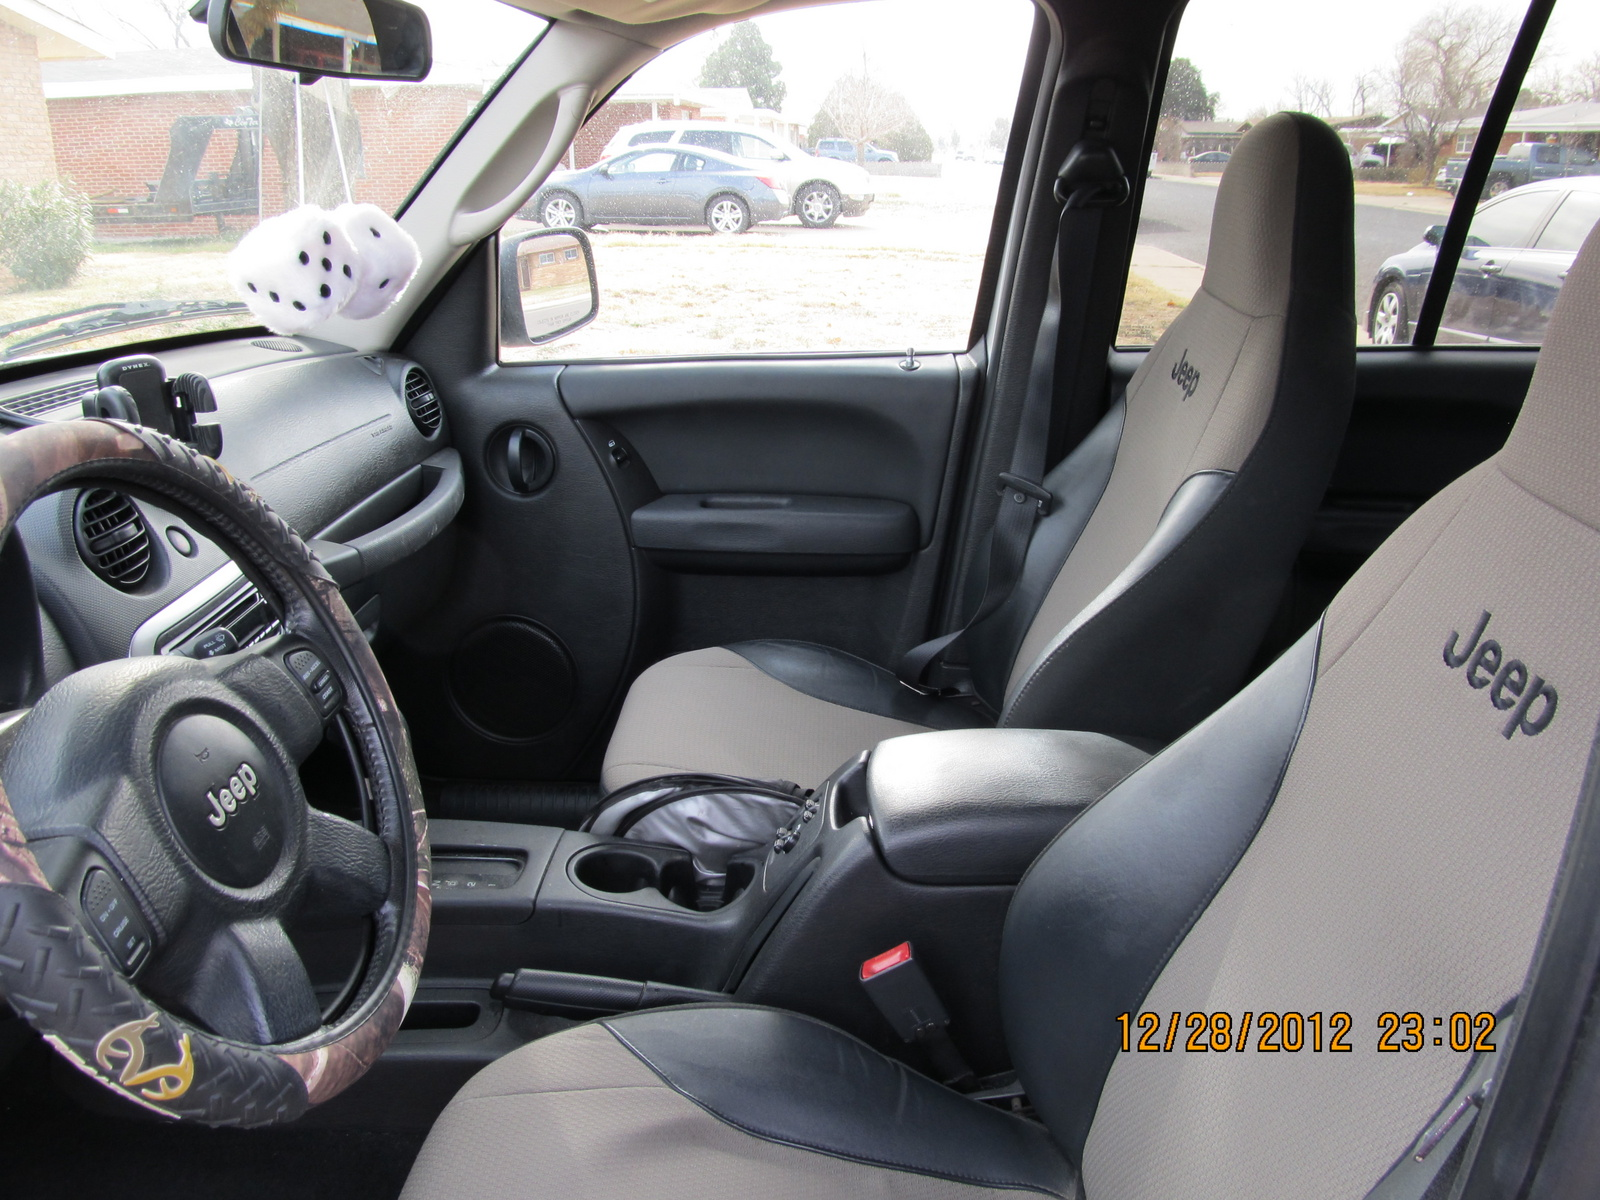 2004 Jeep Liberty - Interior Pictures - CarGurus